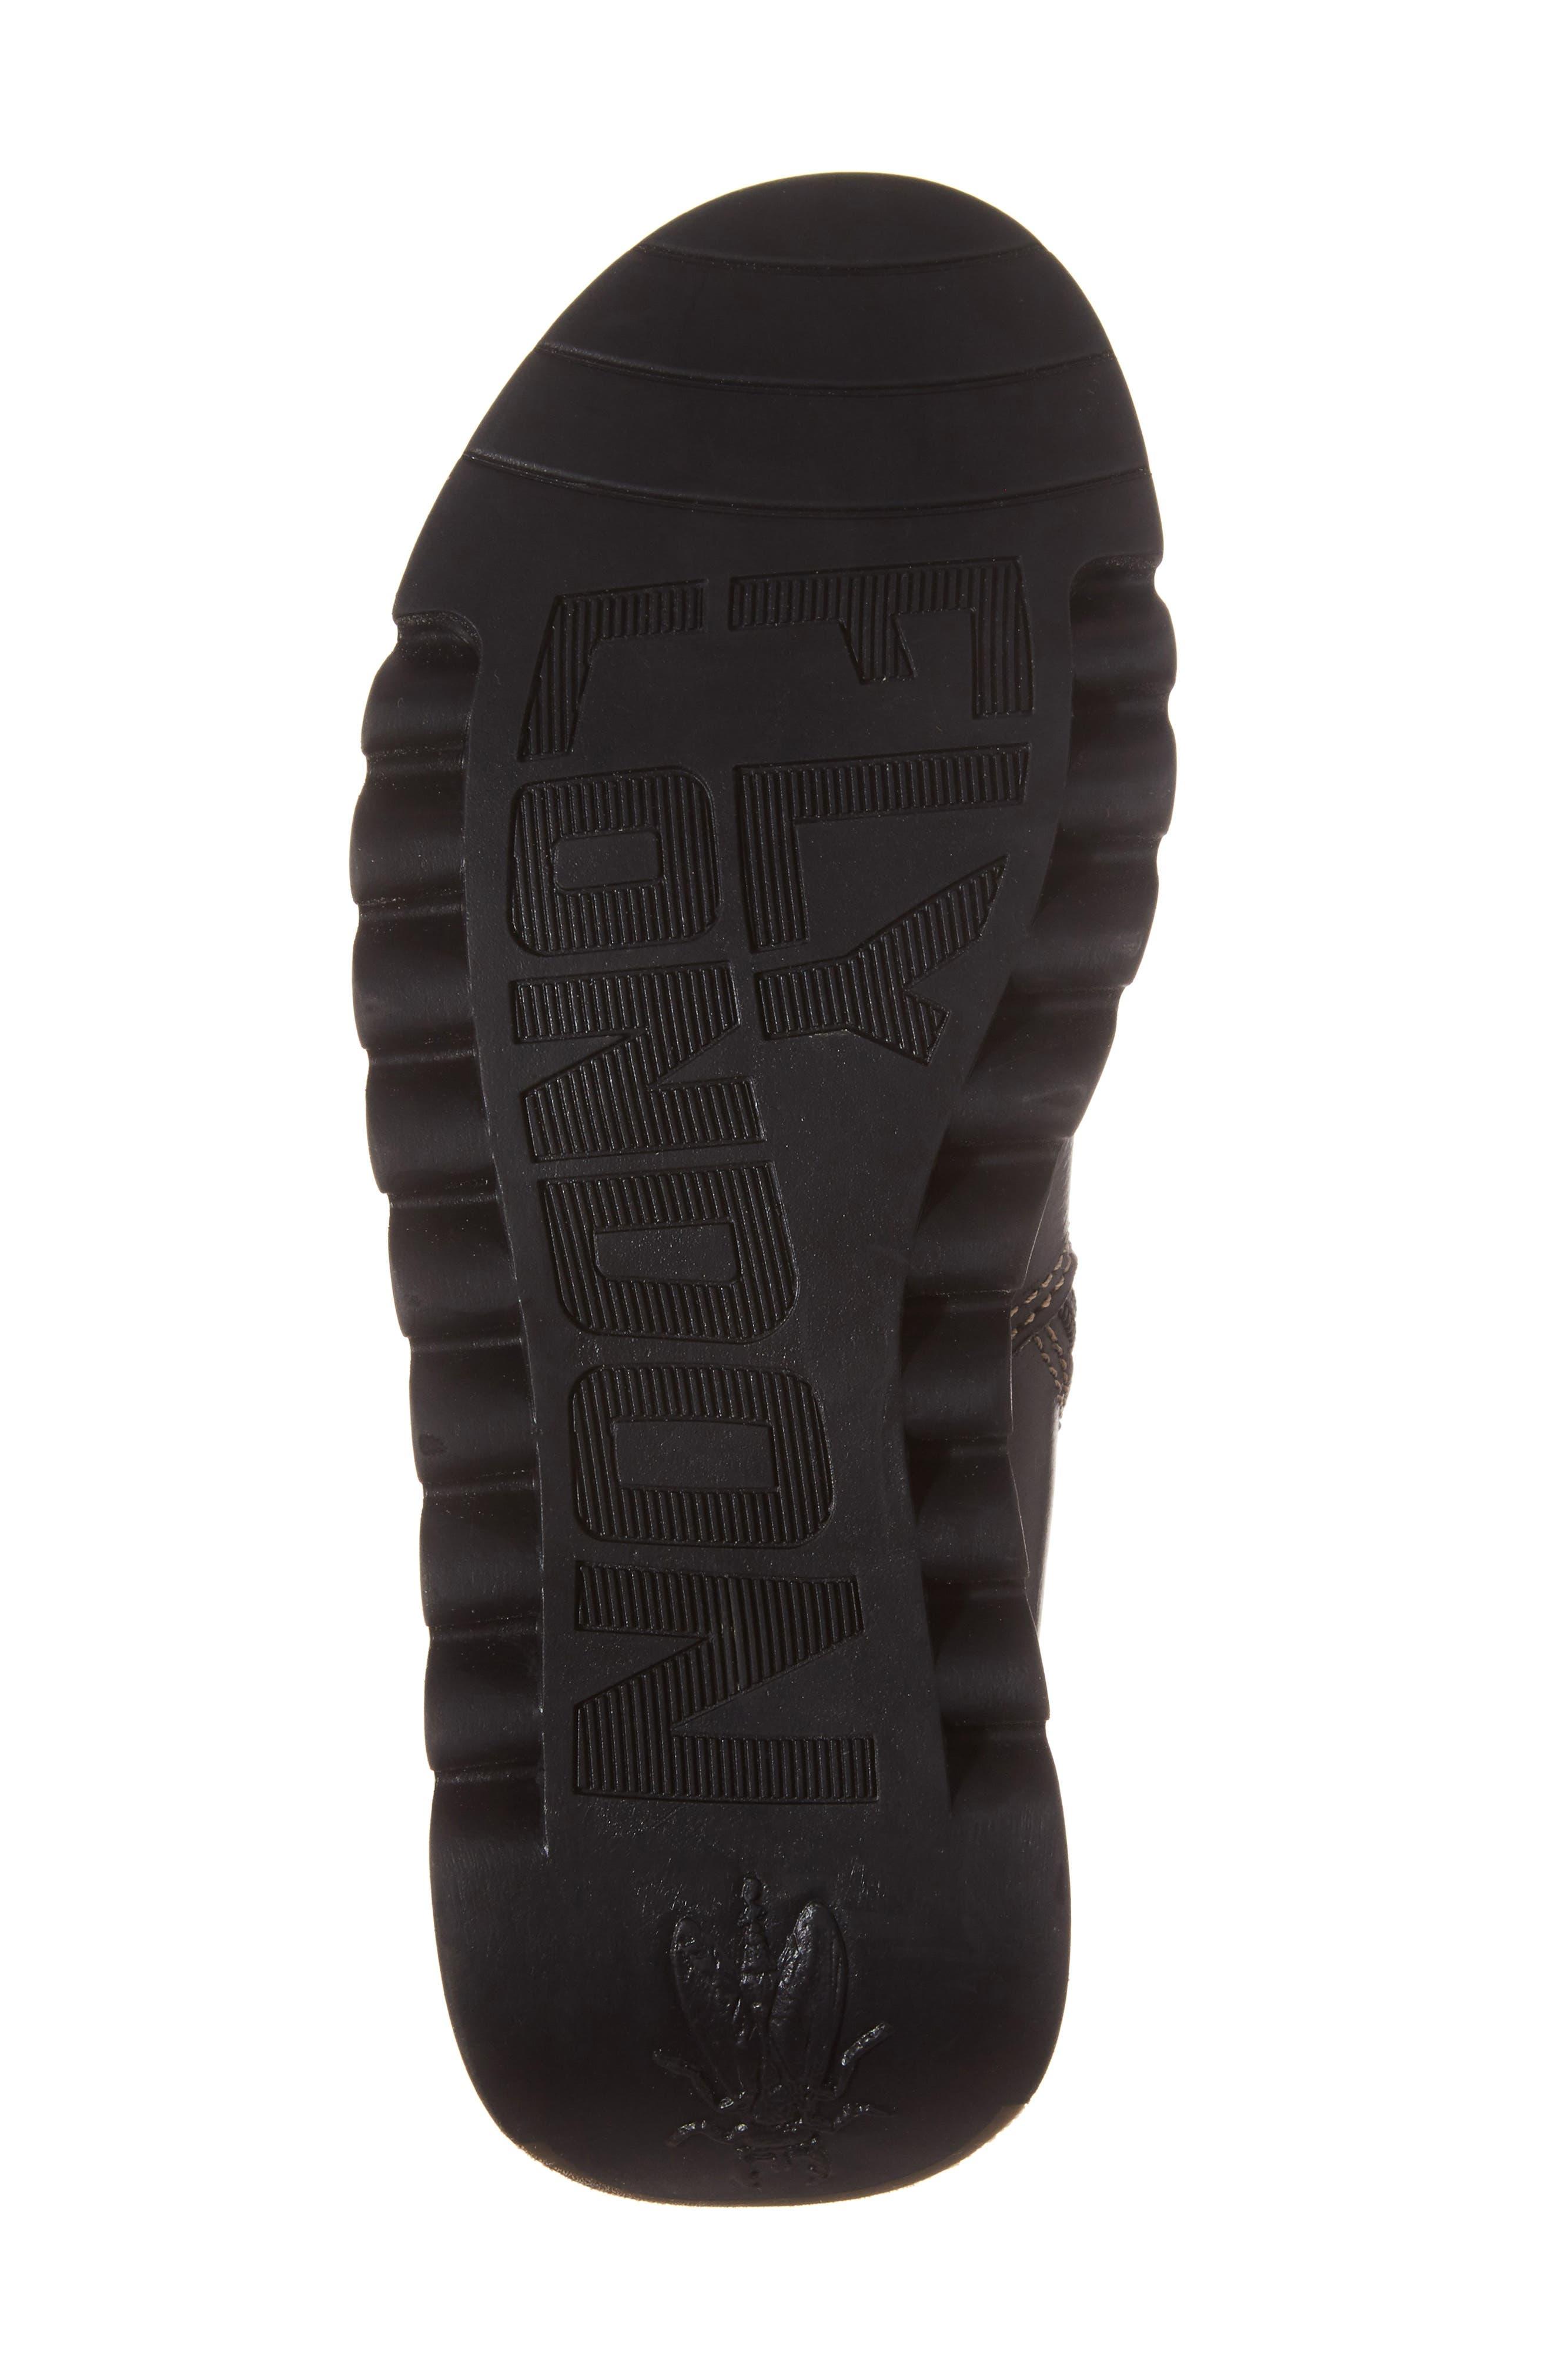 Scop Boot,                             Alternate thumbnail 6, color,                             Black Leather